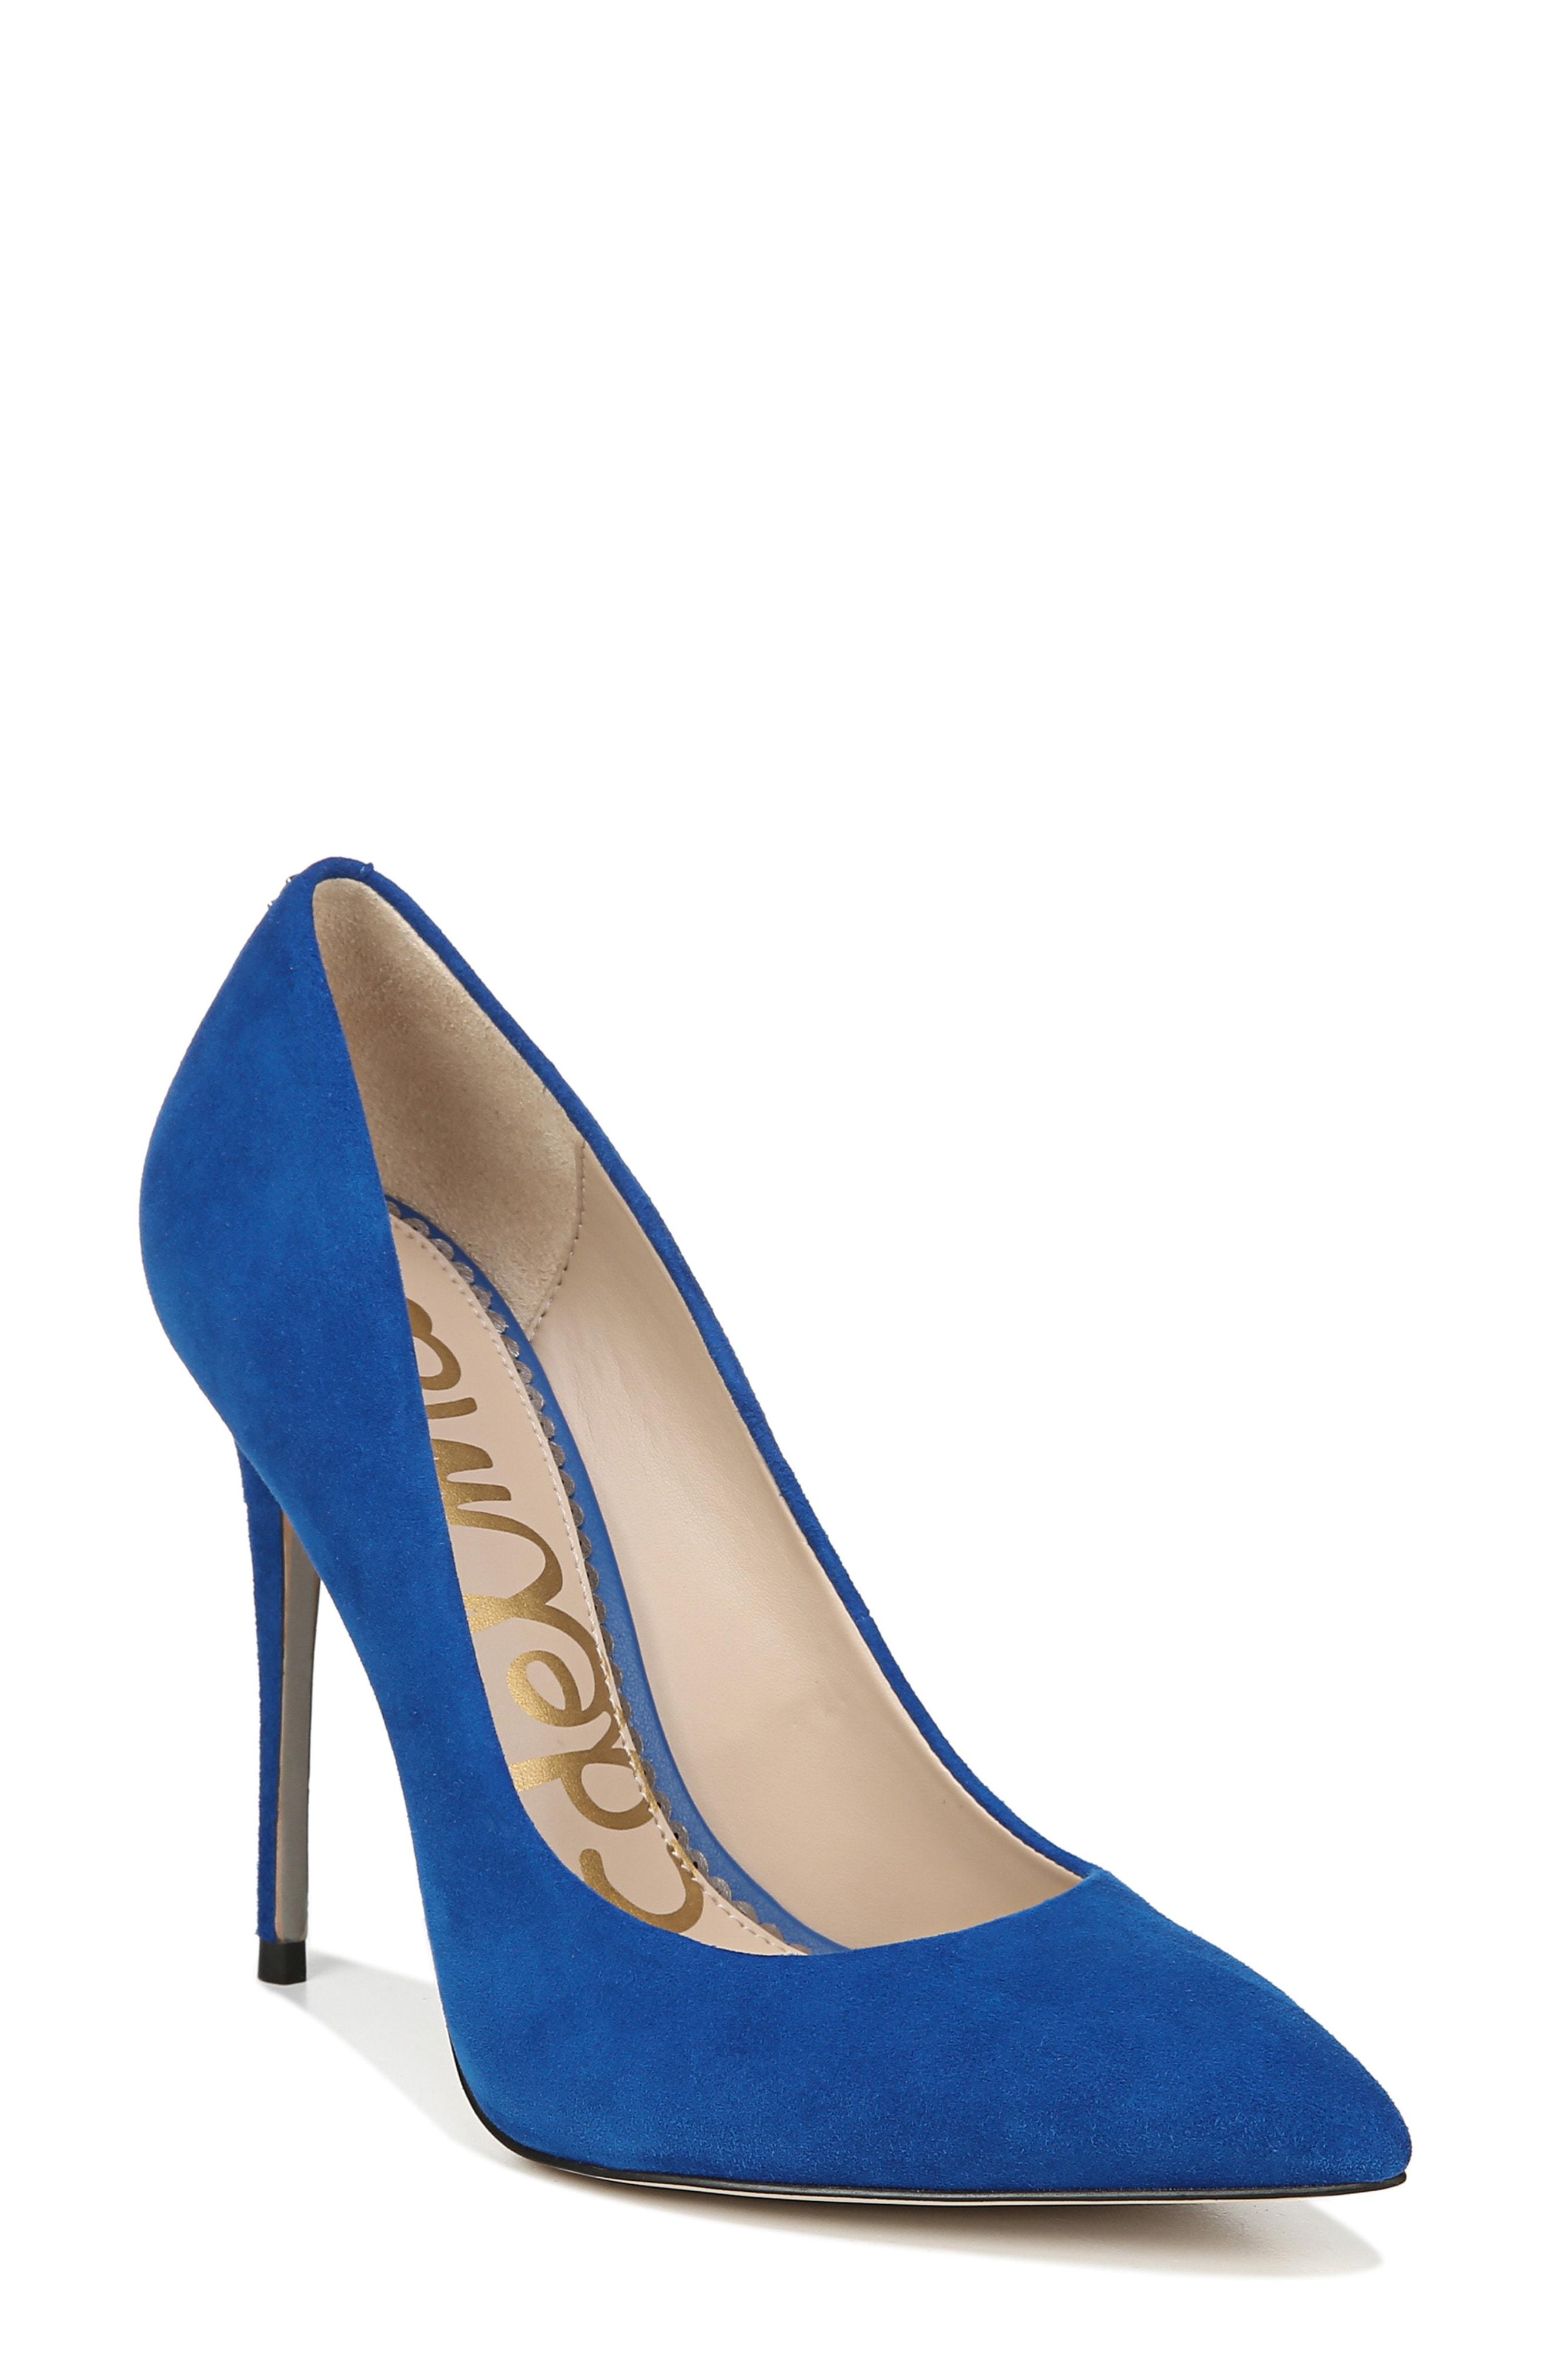 627c1e7de8afa1 Sam Edelman Danna Pointy Toe Pump In Sapphire Blue Suede